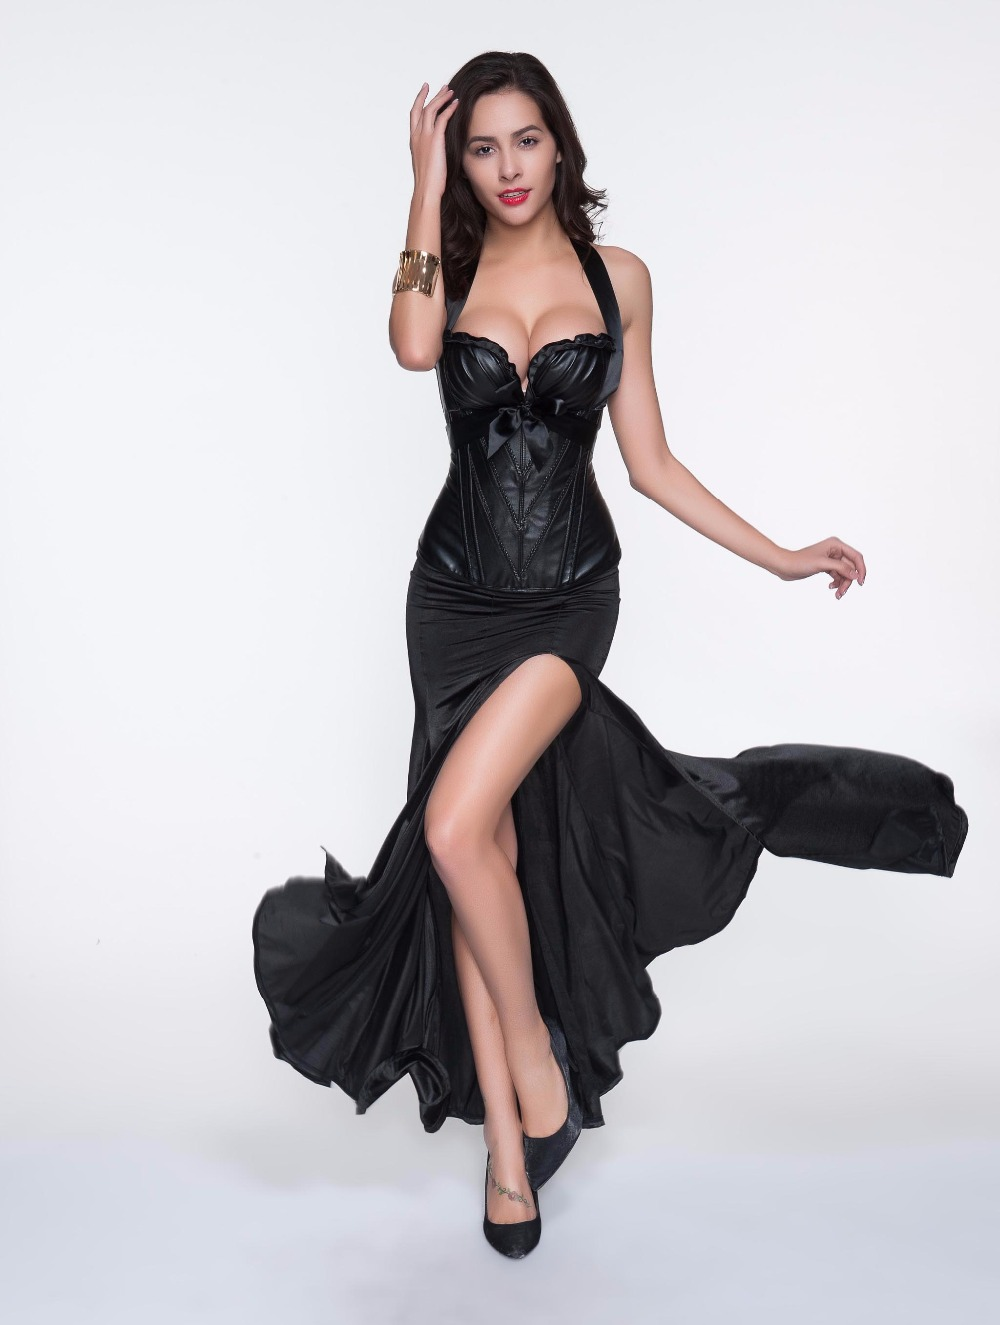 moonight women u0026 39 s sexy maxi split skirts long vintage skirt fashion satin high waist evening